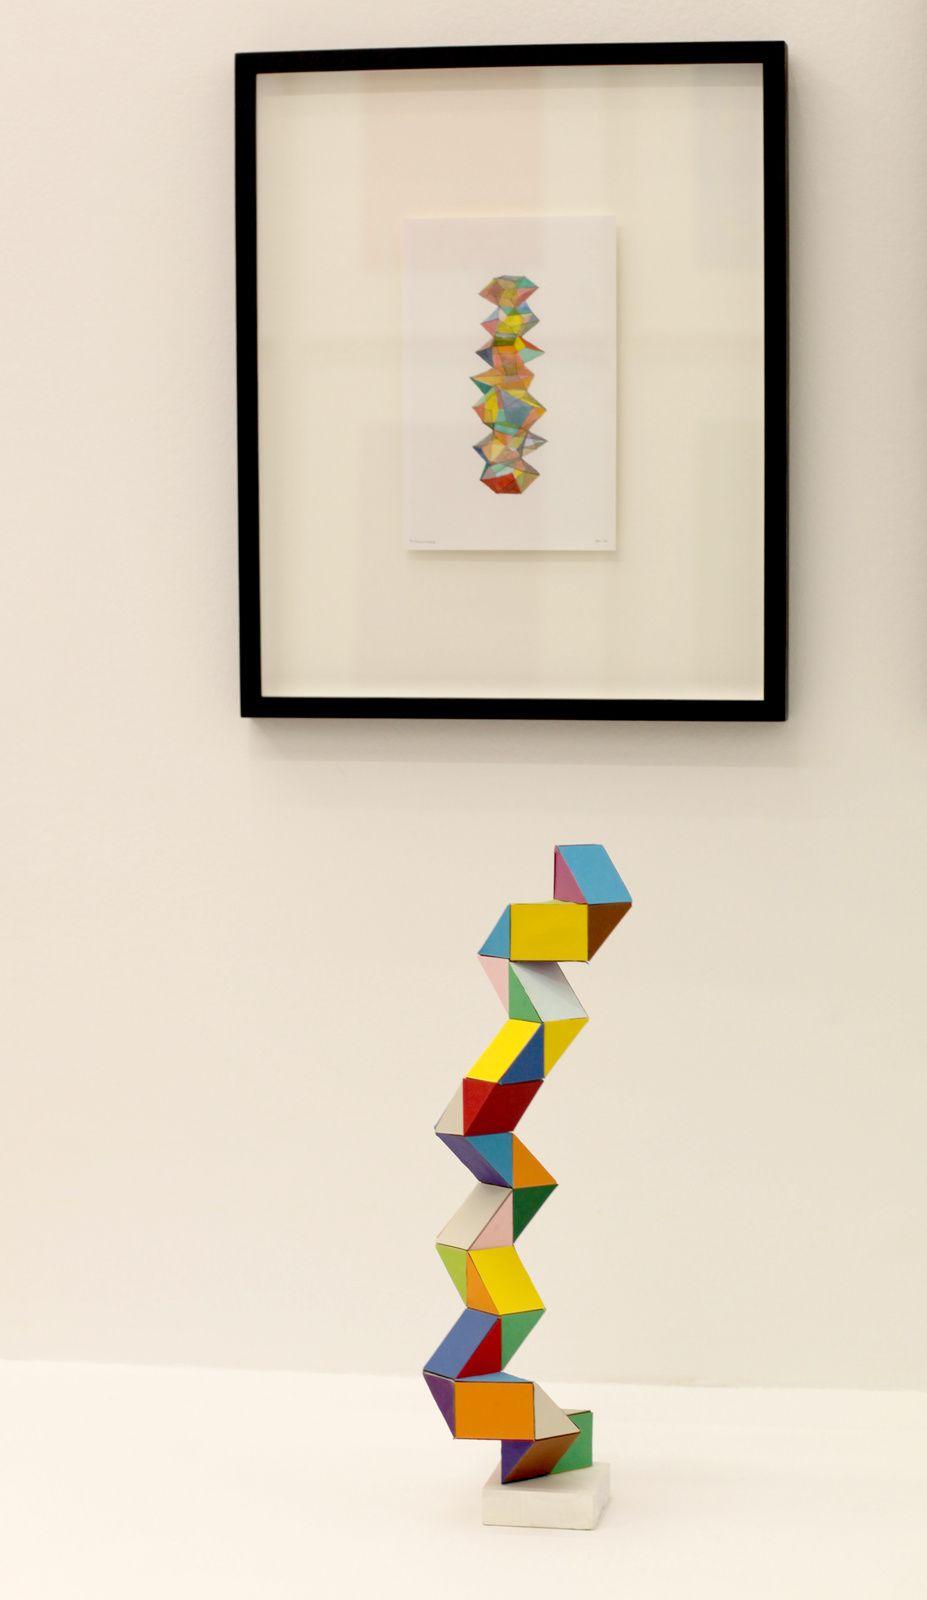 """Tower"", 2016 de Beat ZODERER - Courtesy Galerie Semiose © Photo Éric Simon"